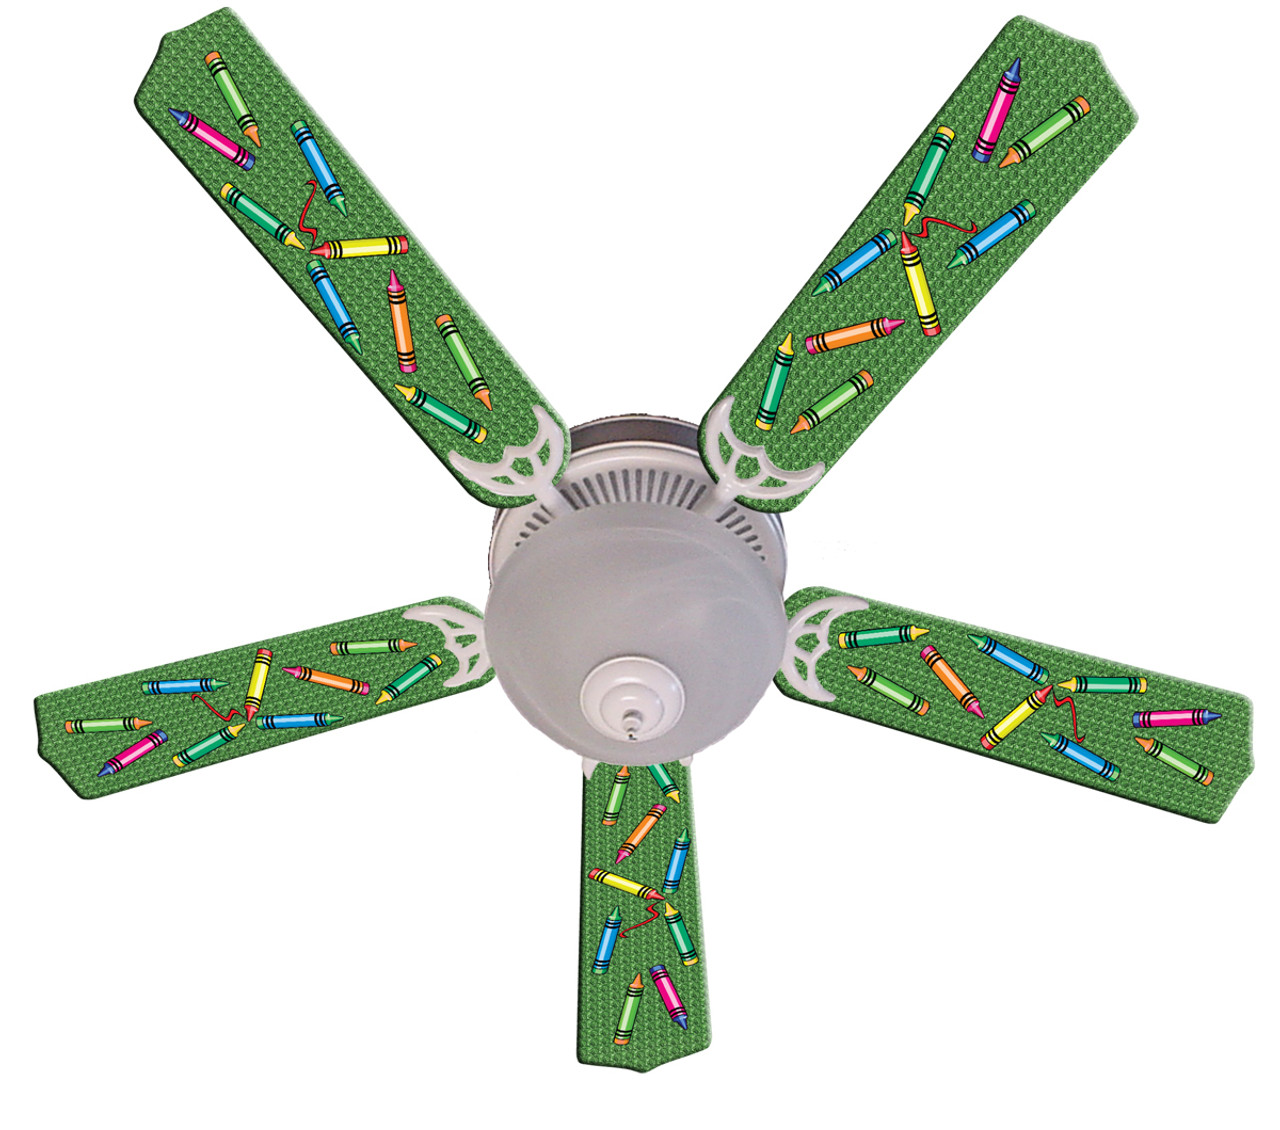 Kids Colorful Crayons Ceiling Fan 52 Ceiling Fans Kids Room Decor